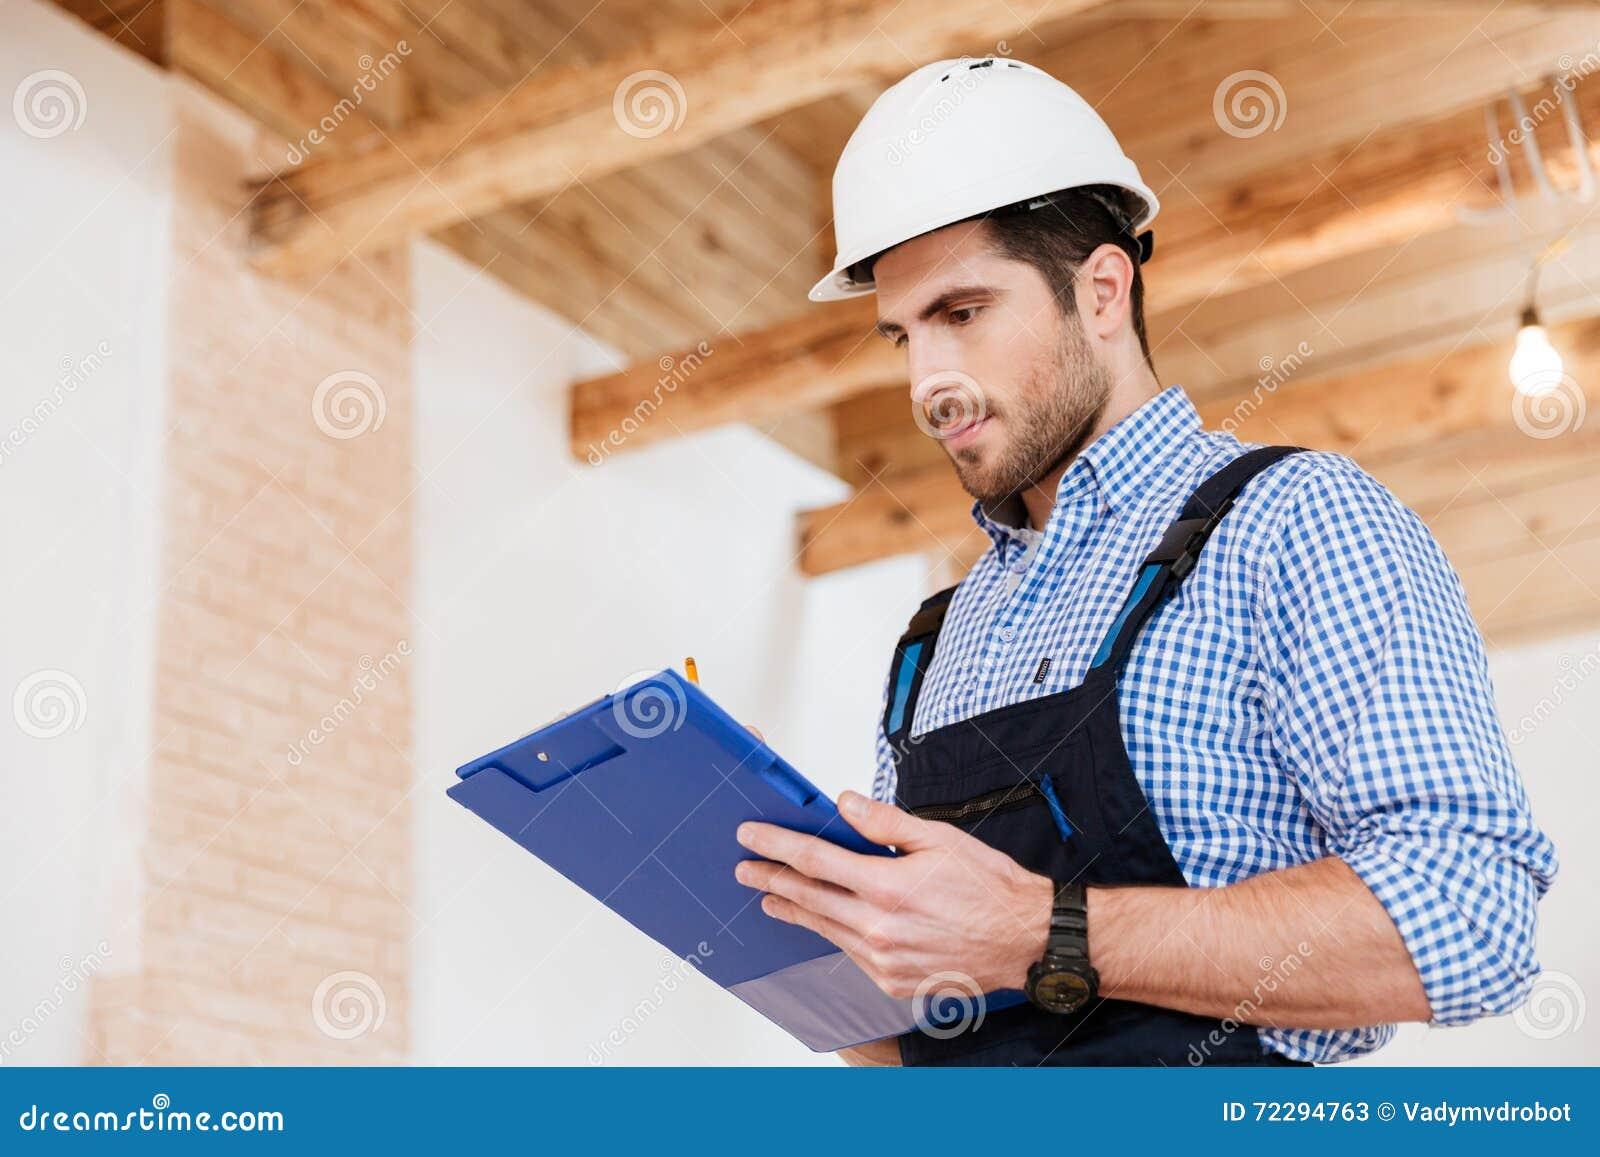 Essay writers world building